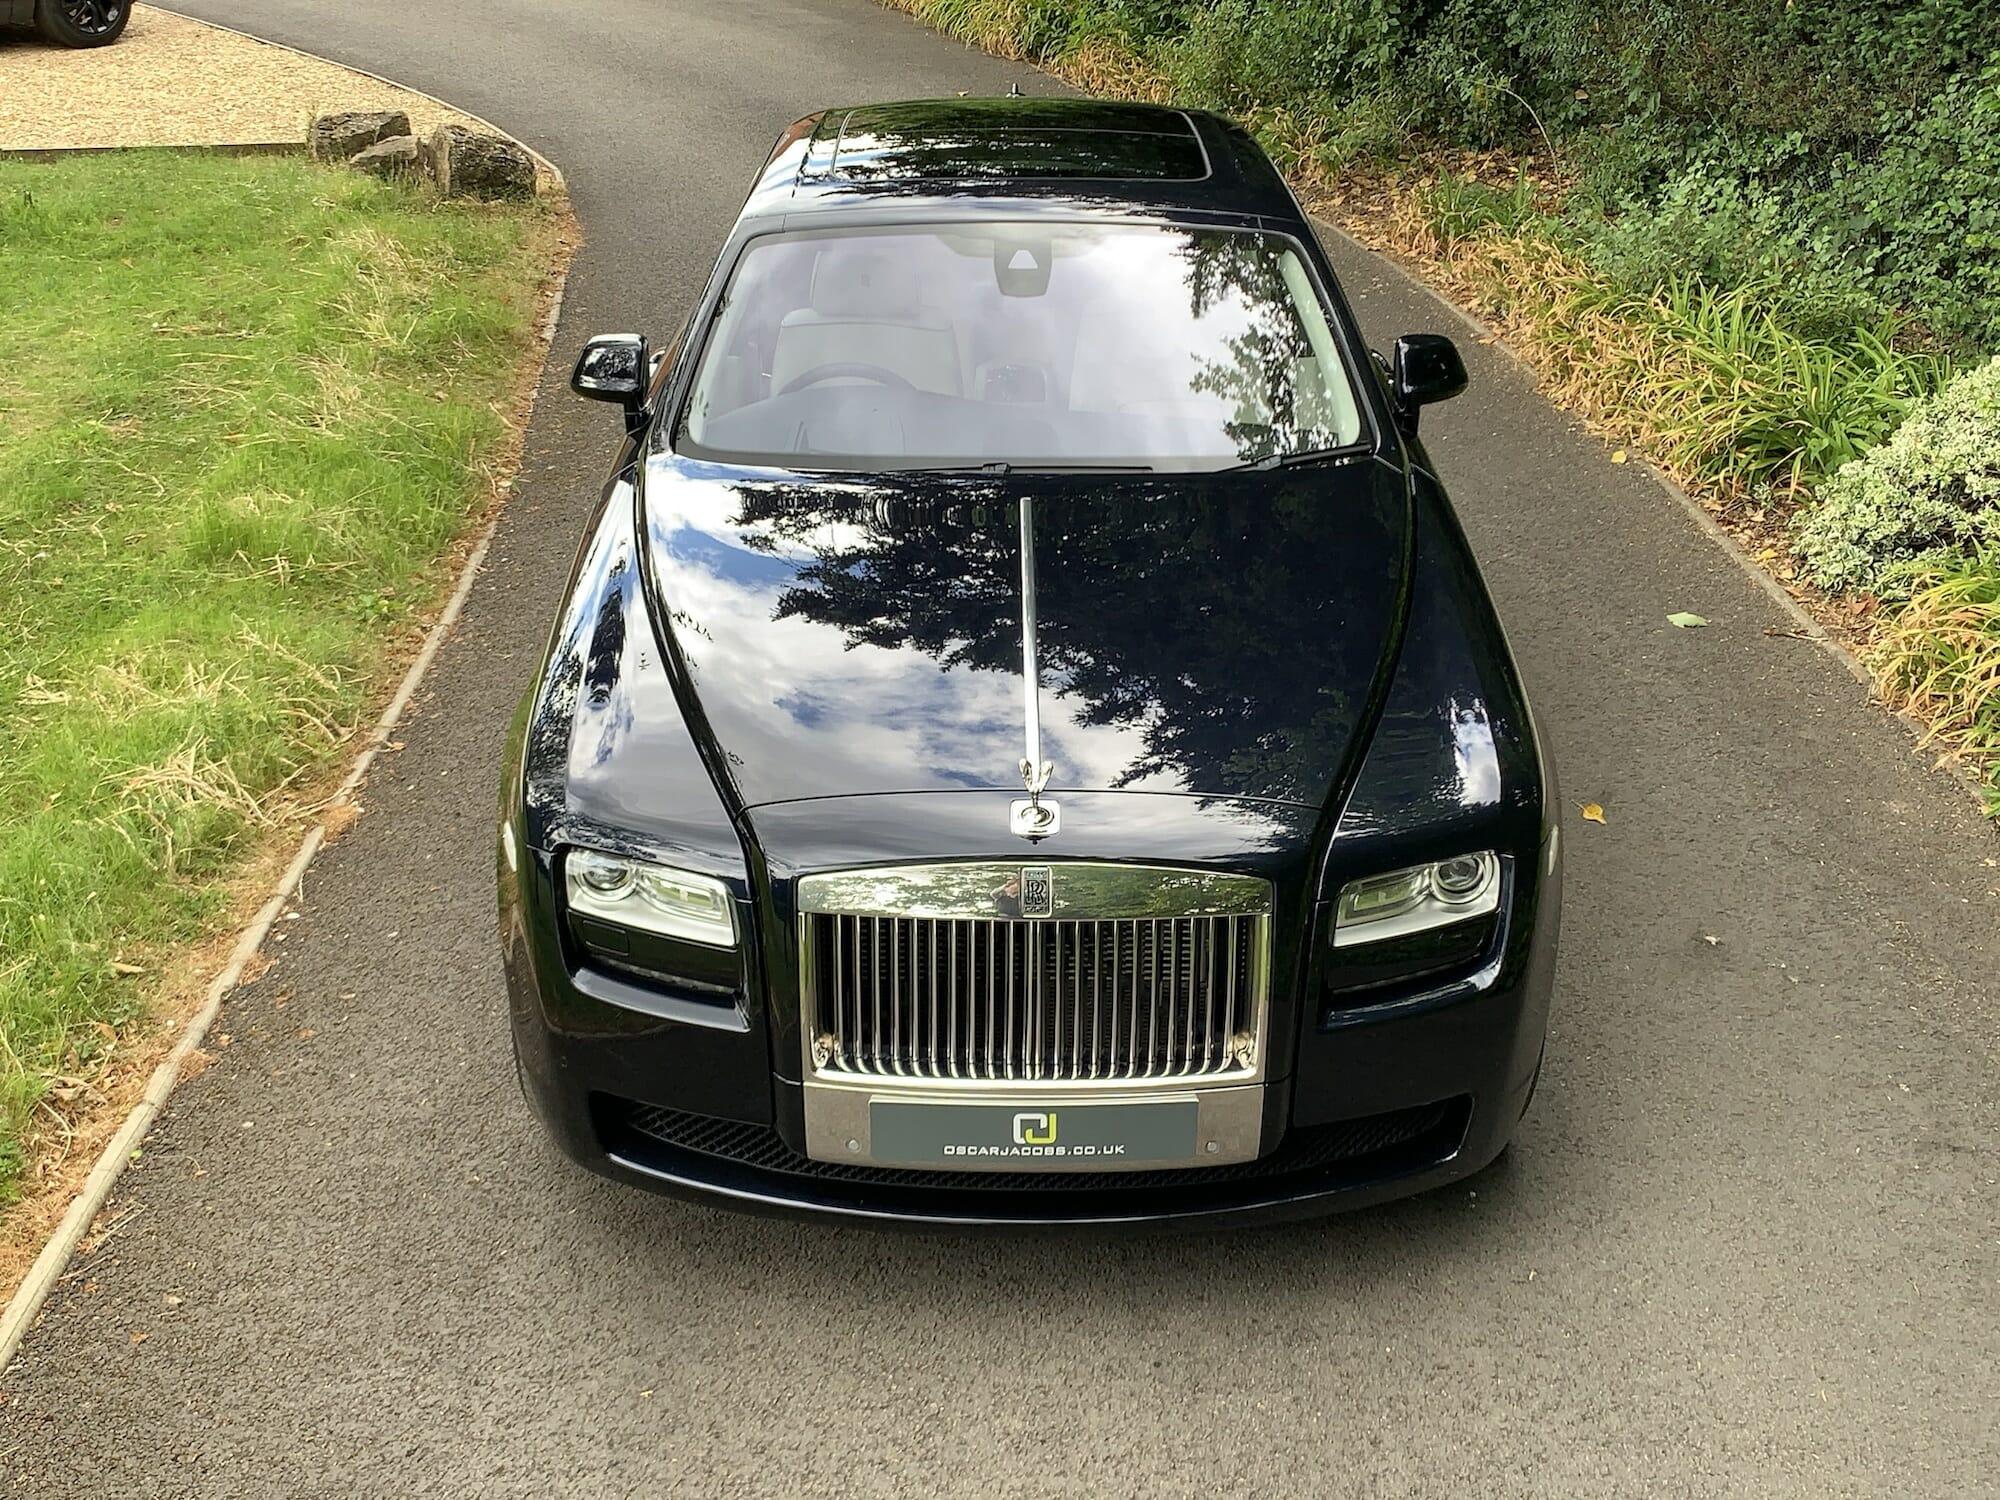 Rolls Royce Ghost V-Spec 2014 - Oscar Jacobs